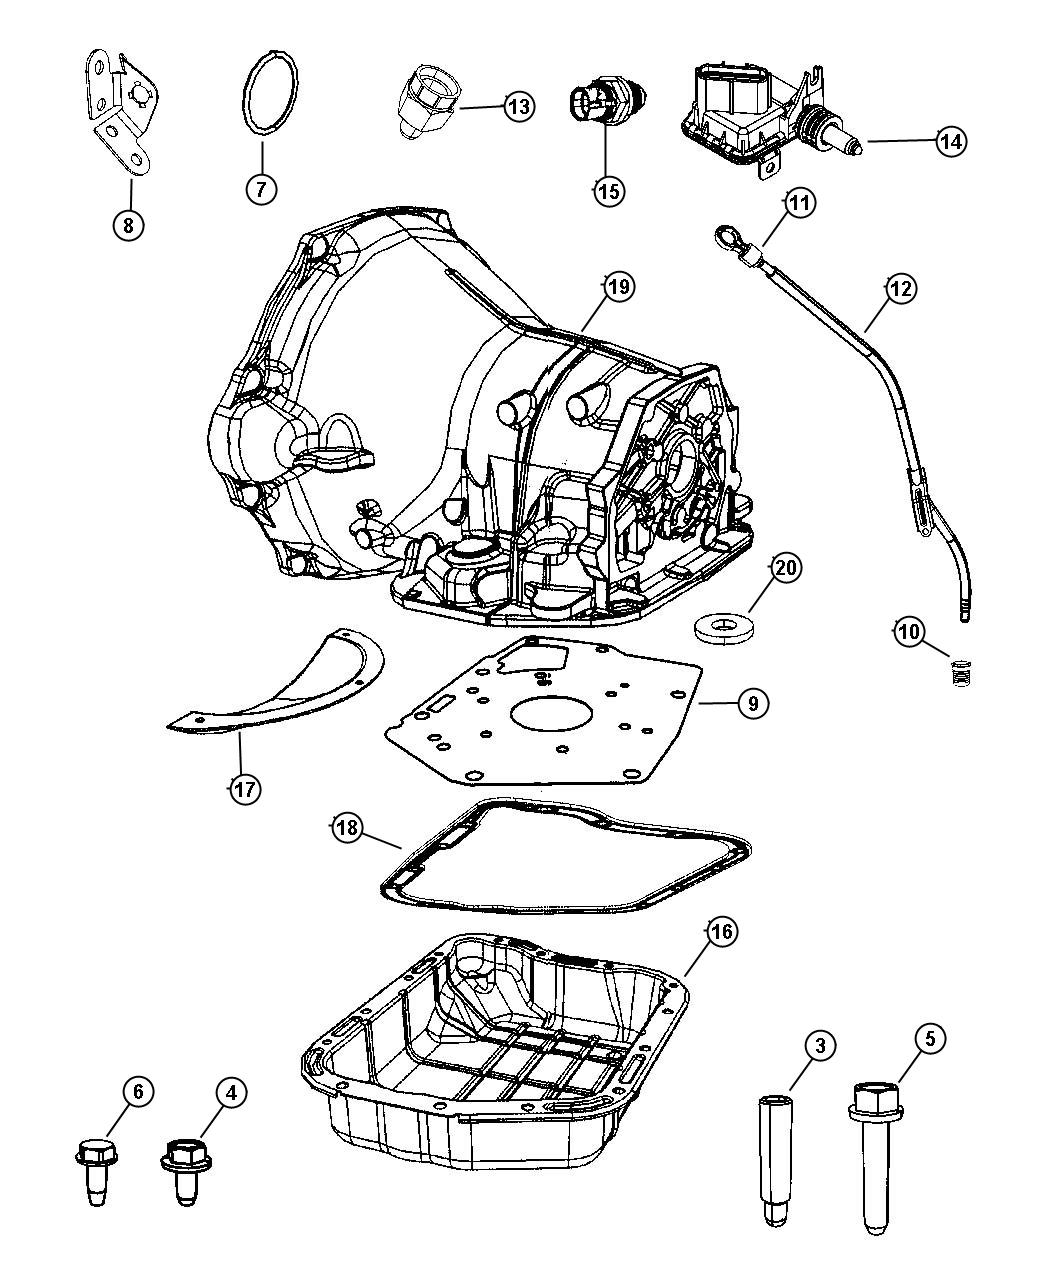 36rh transmission diagram